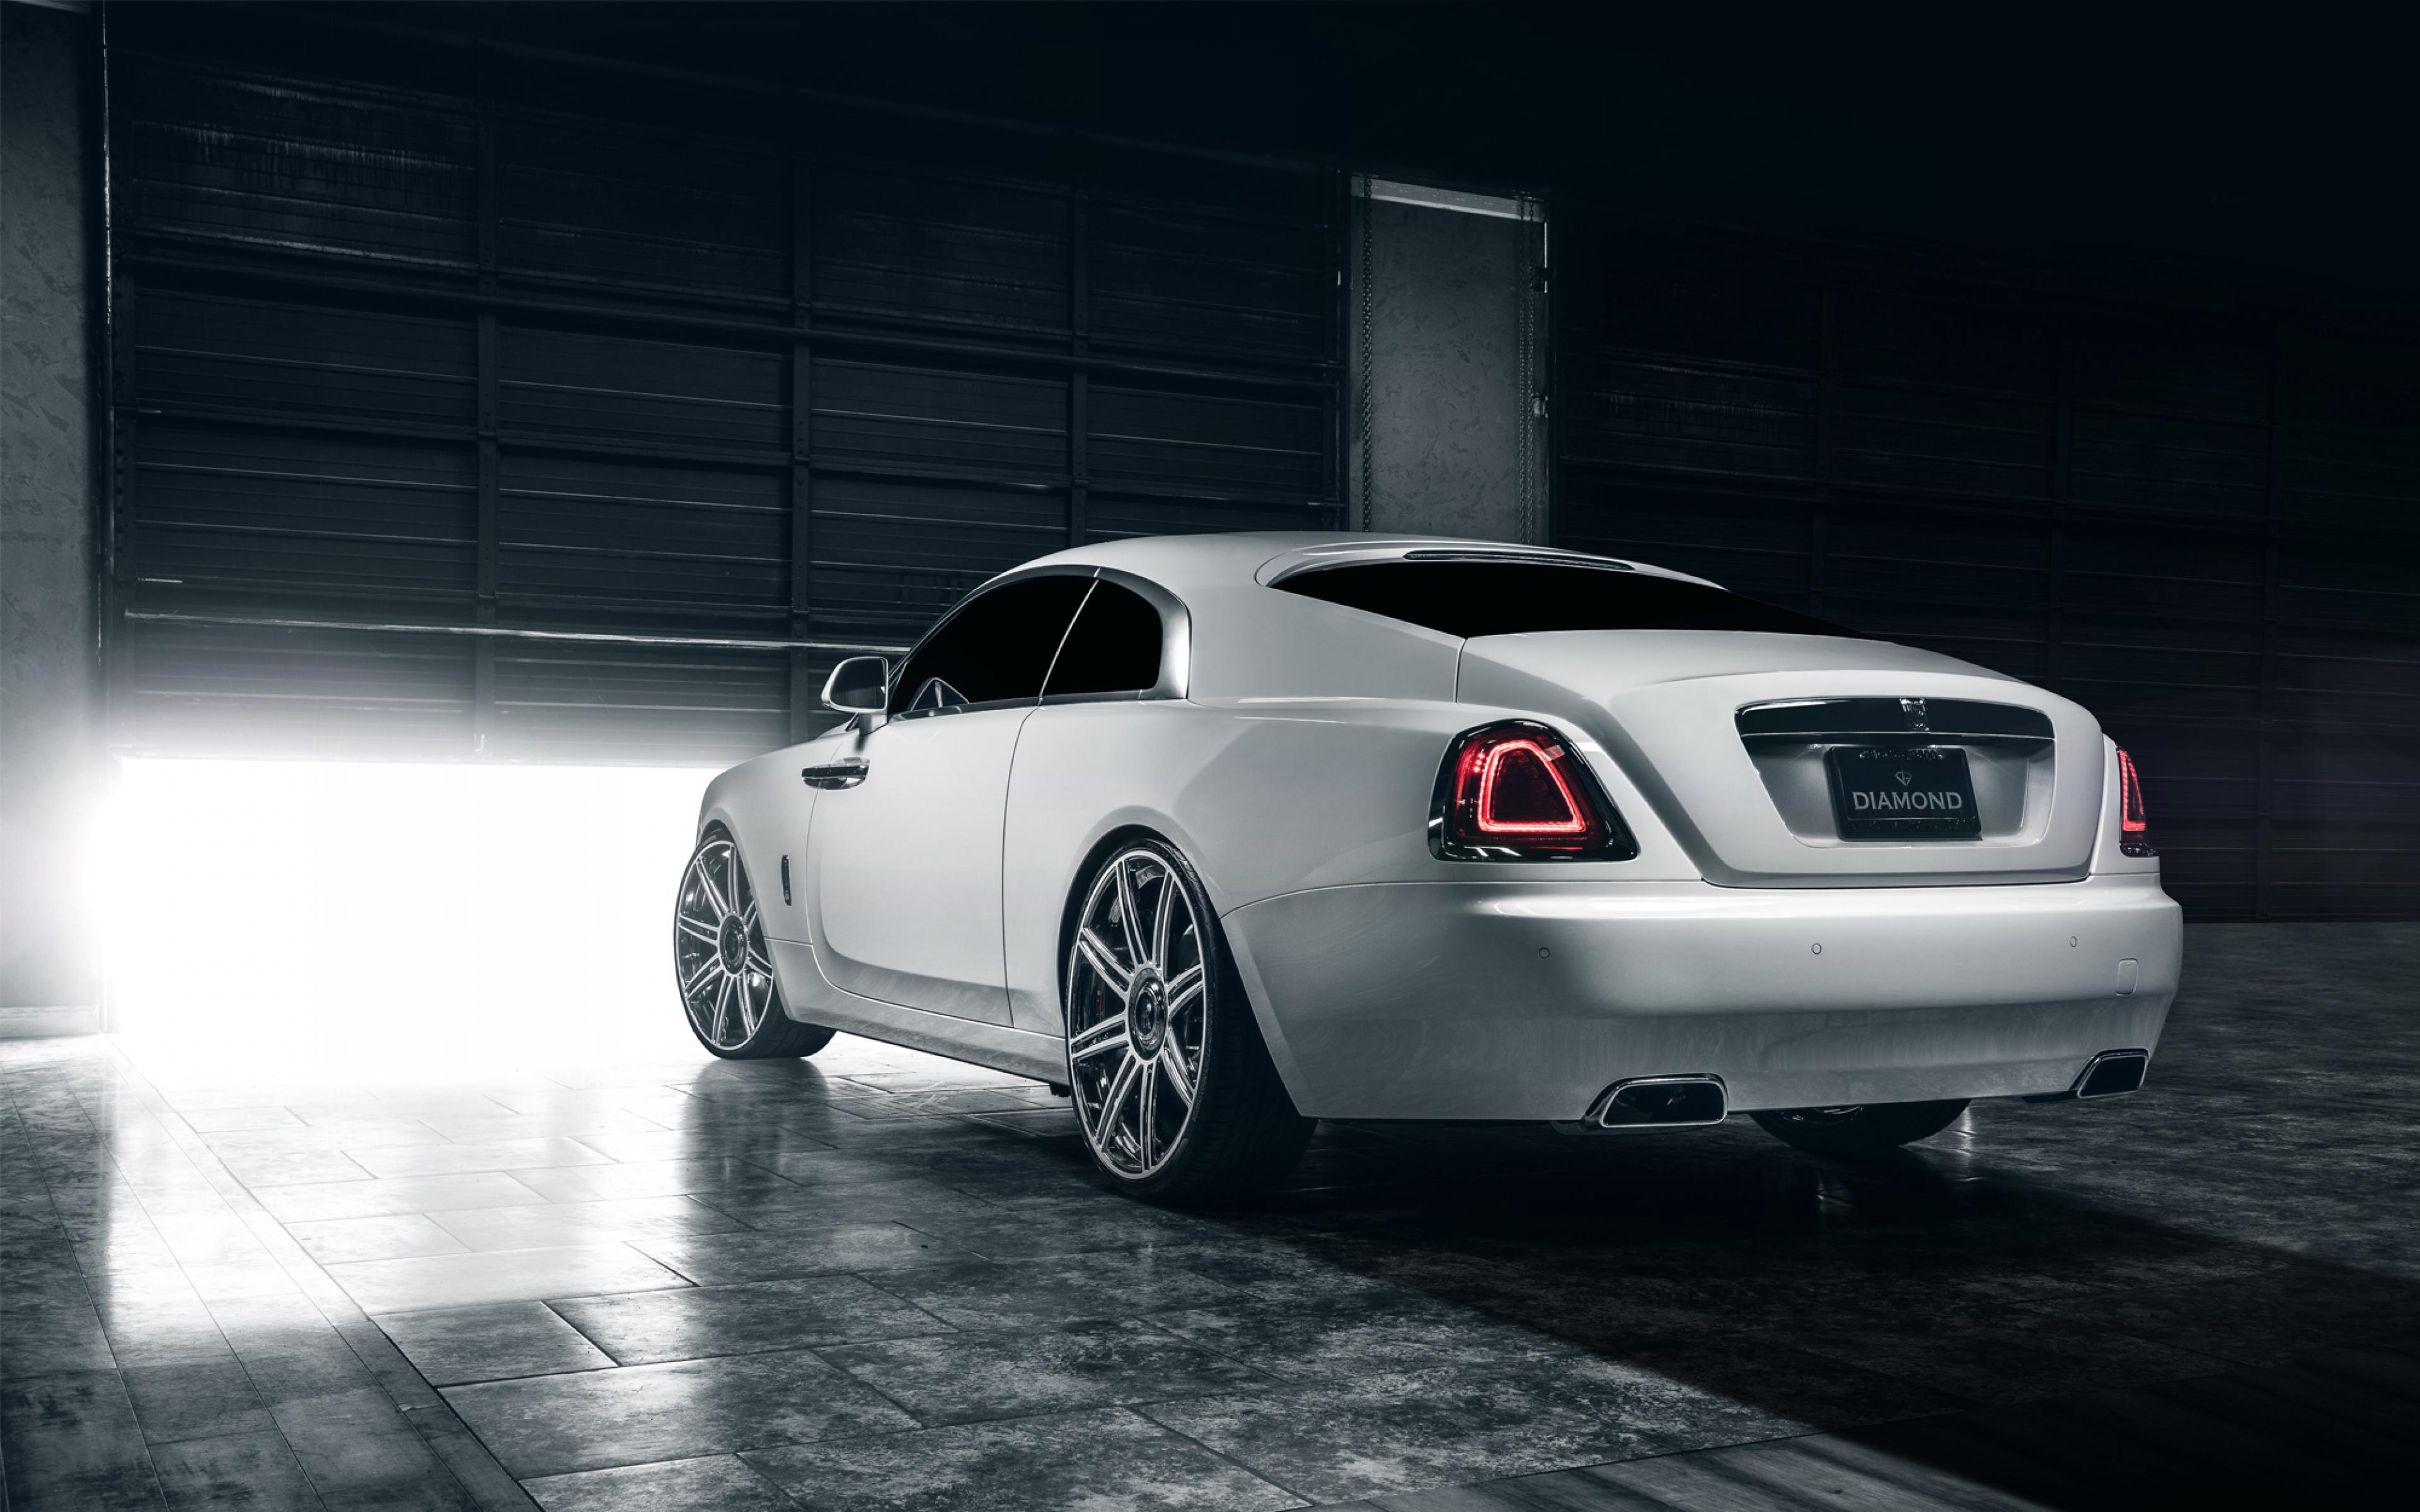 Luxury Vehicle: 26 Stunning HD Luxury Wallpapers